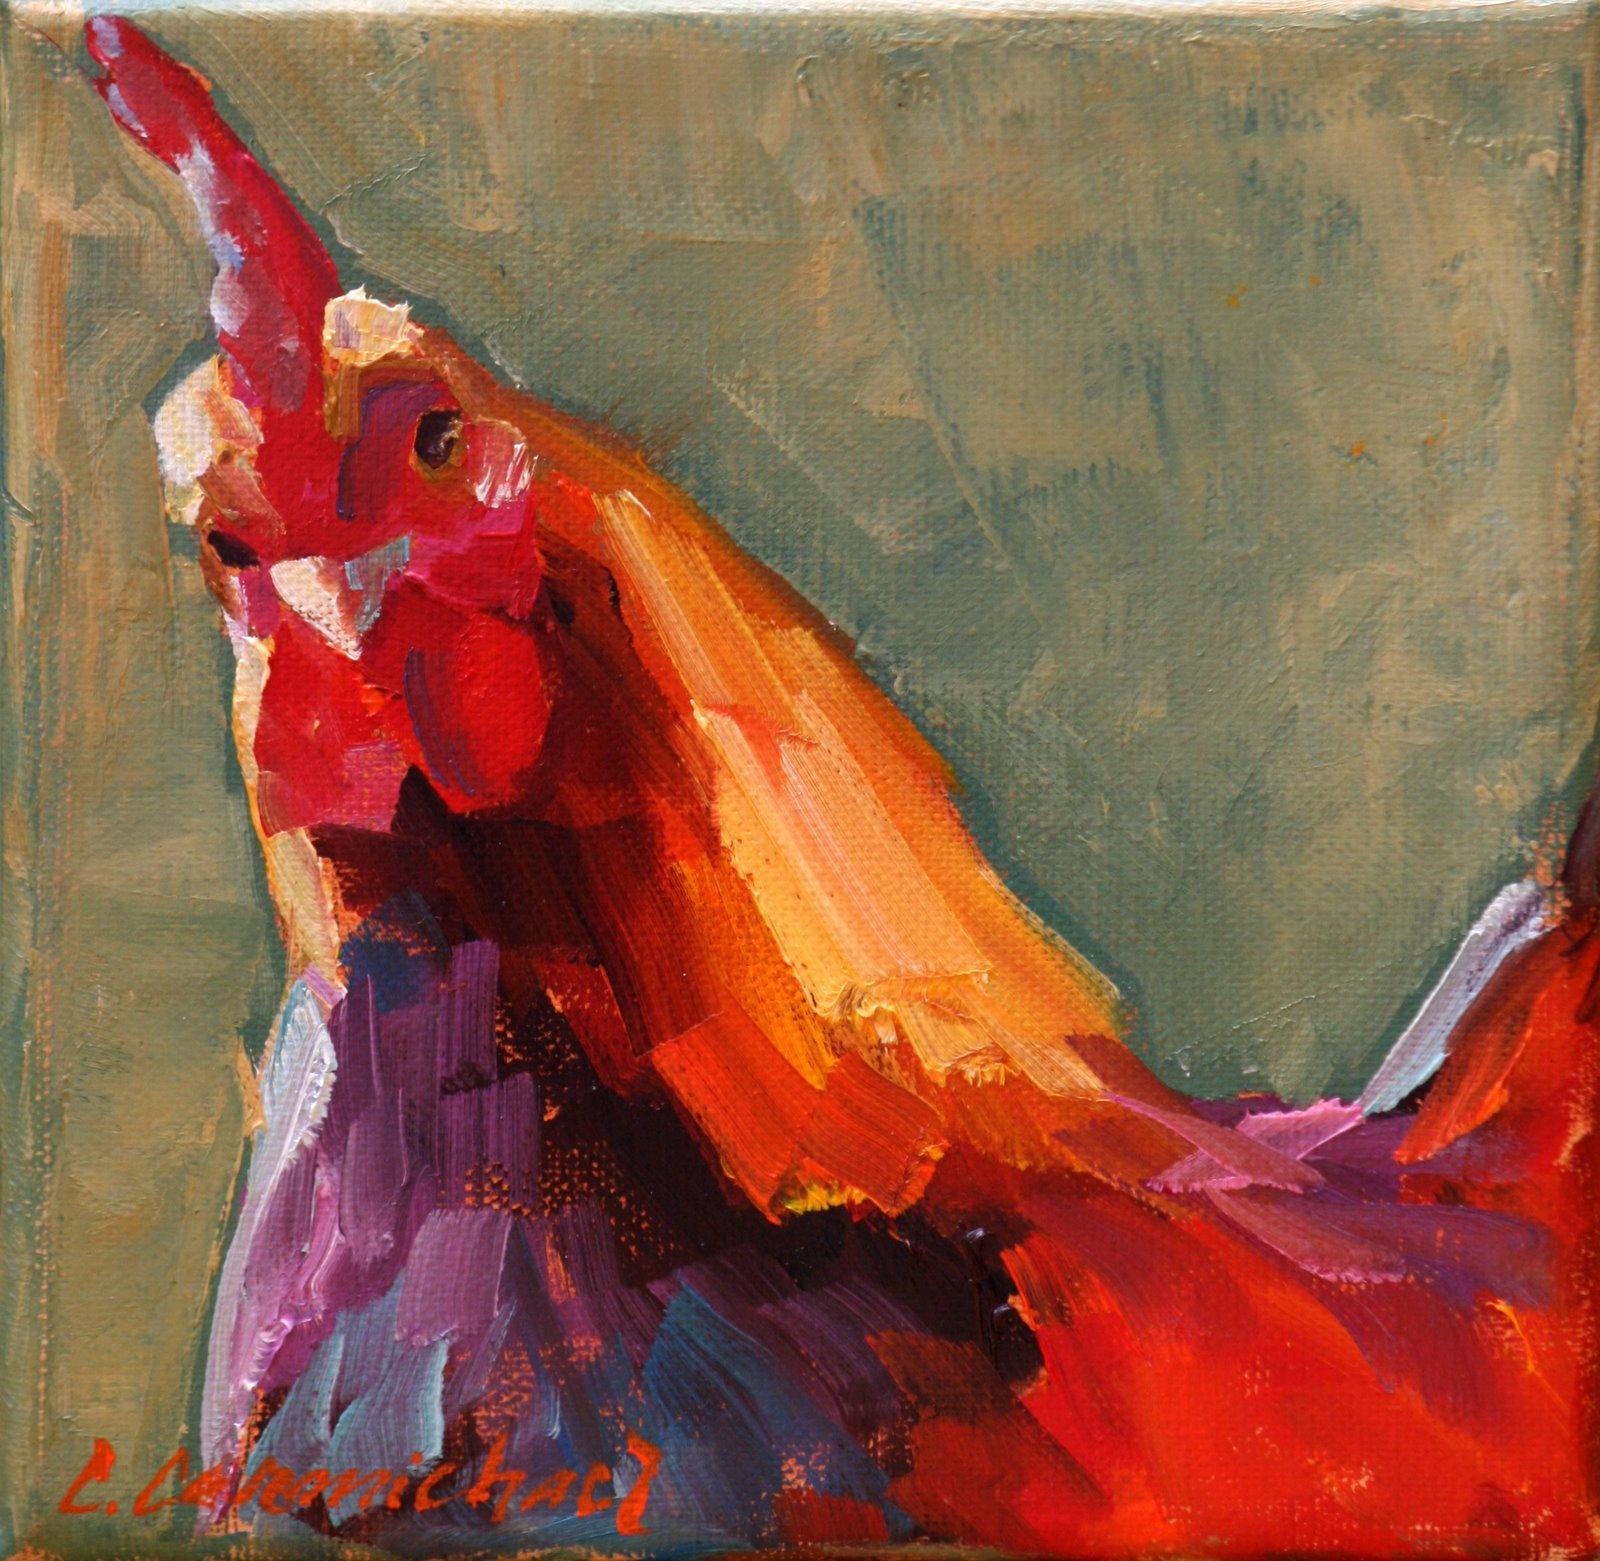 """"" original fine art by Carol Carmichael"